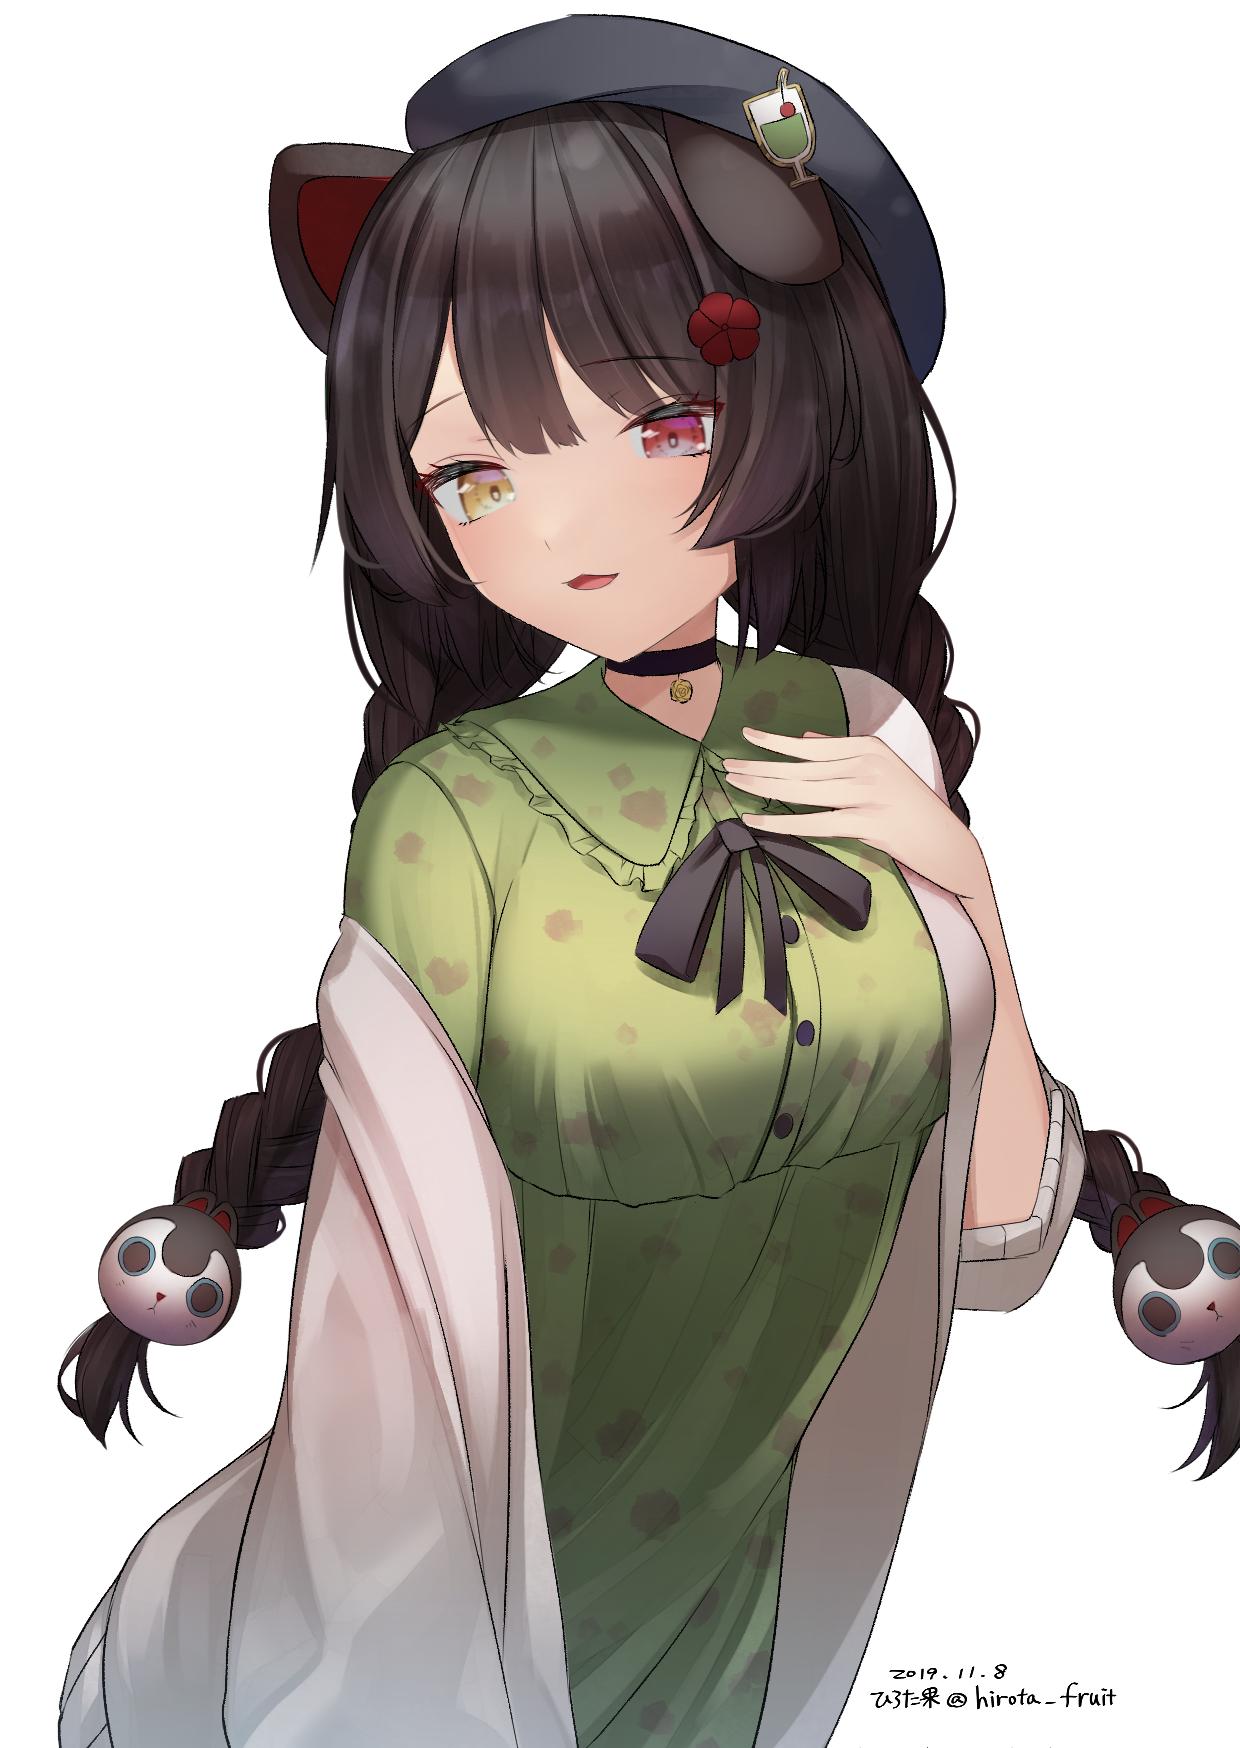 Fondos De Pantalla Anime Chicas Anime Tetas Vestir